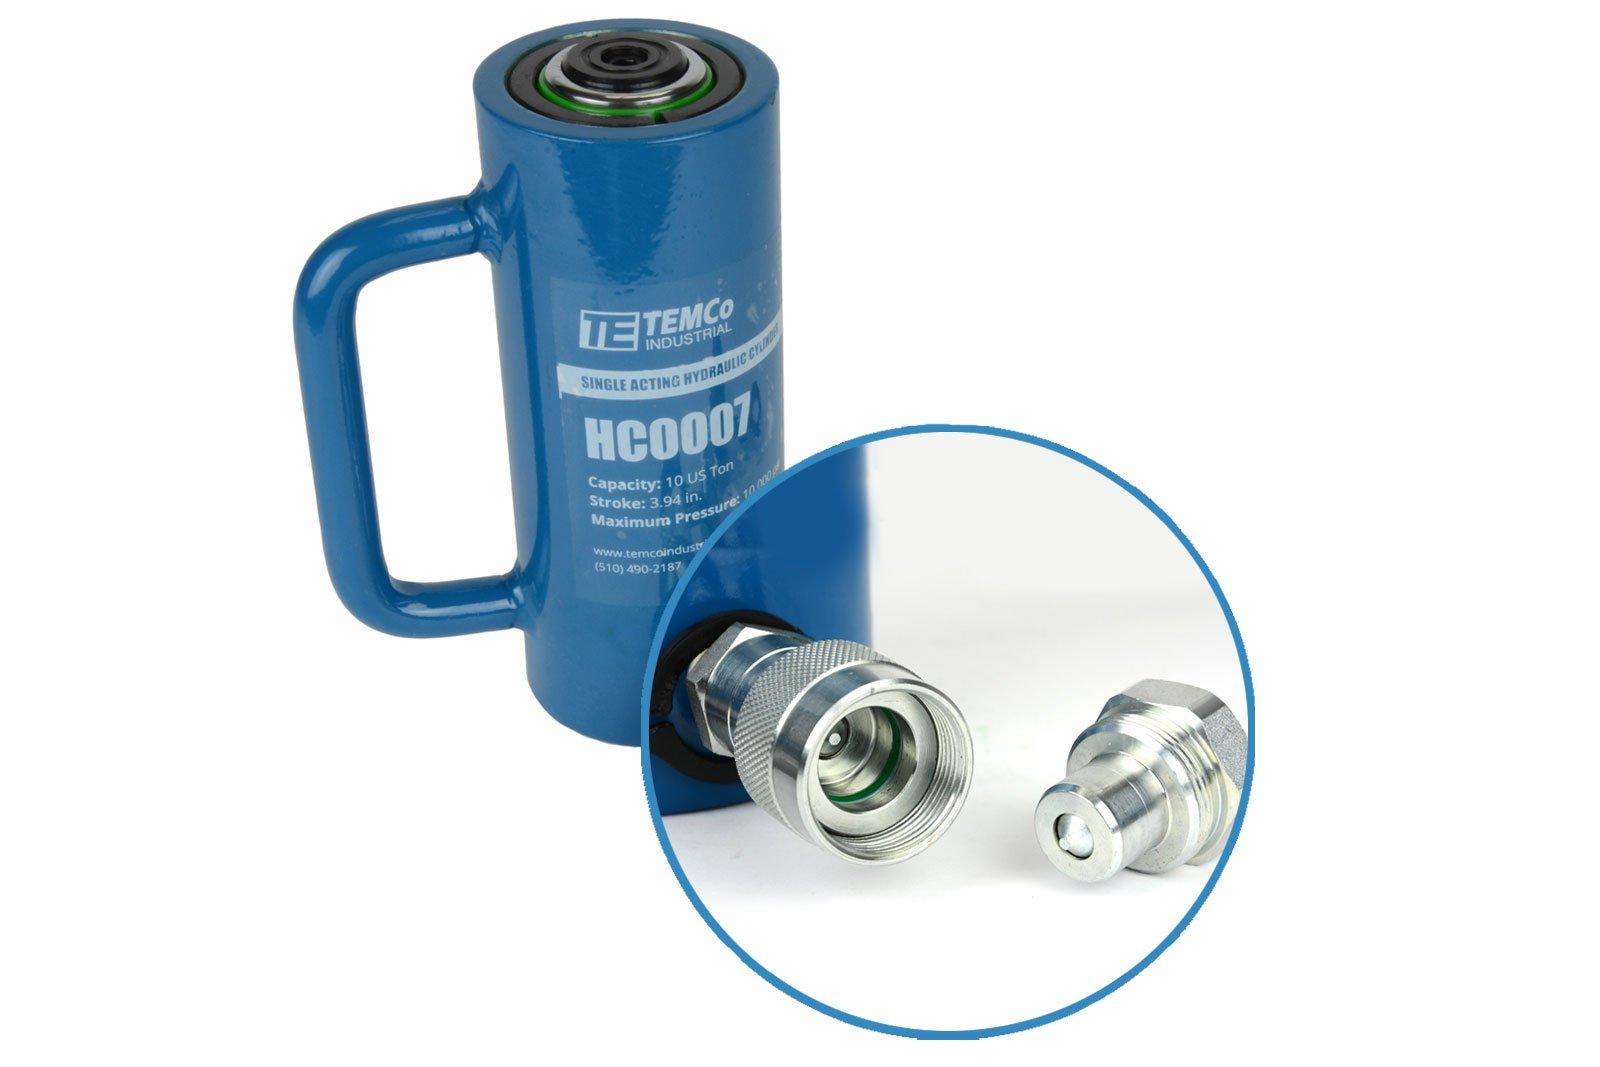 TEMCo HC0007 - Hydraulic Cylinder Ram Single Acting 10 TON 4'' Inch Stroke - 5 YEAR Warranty